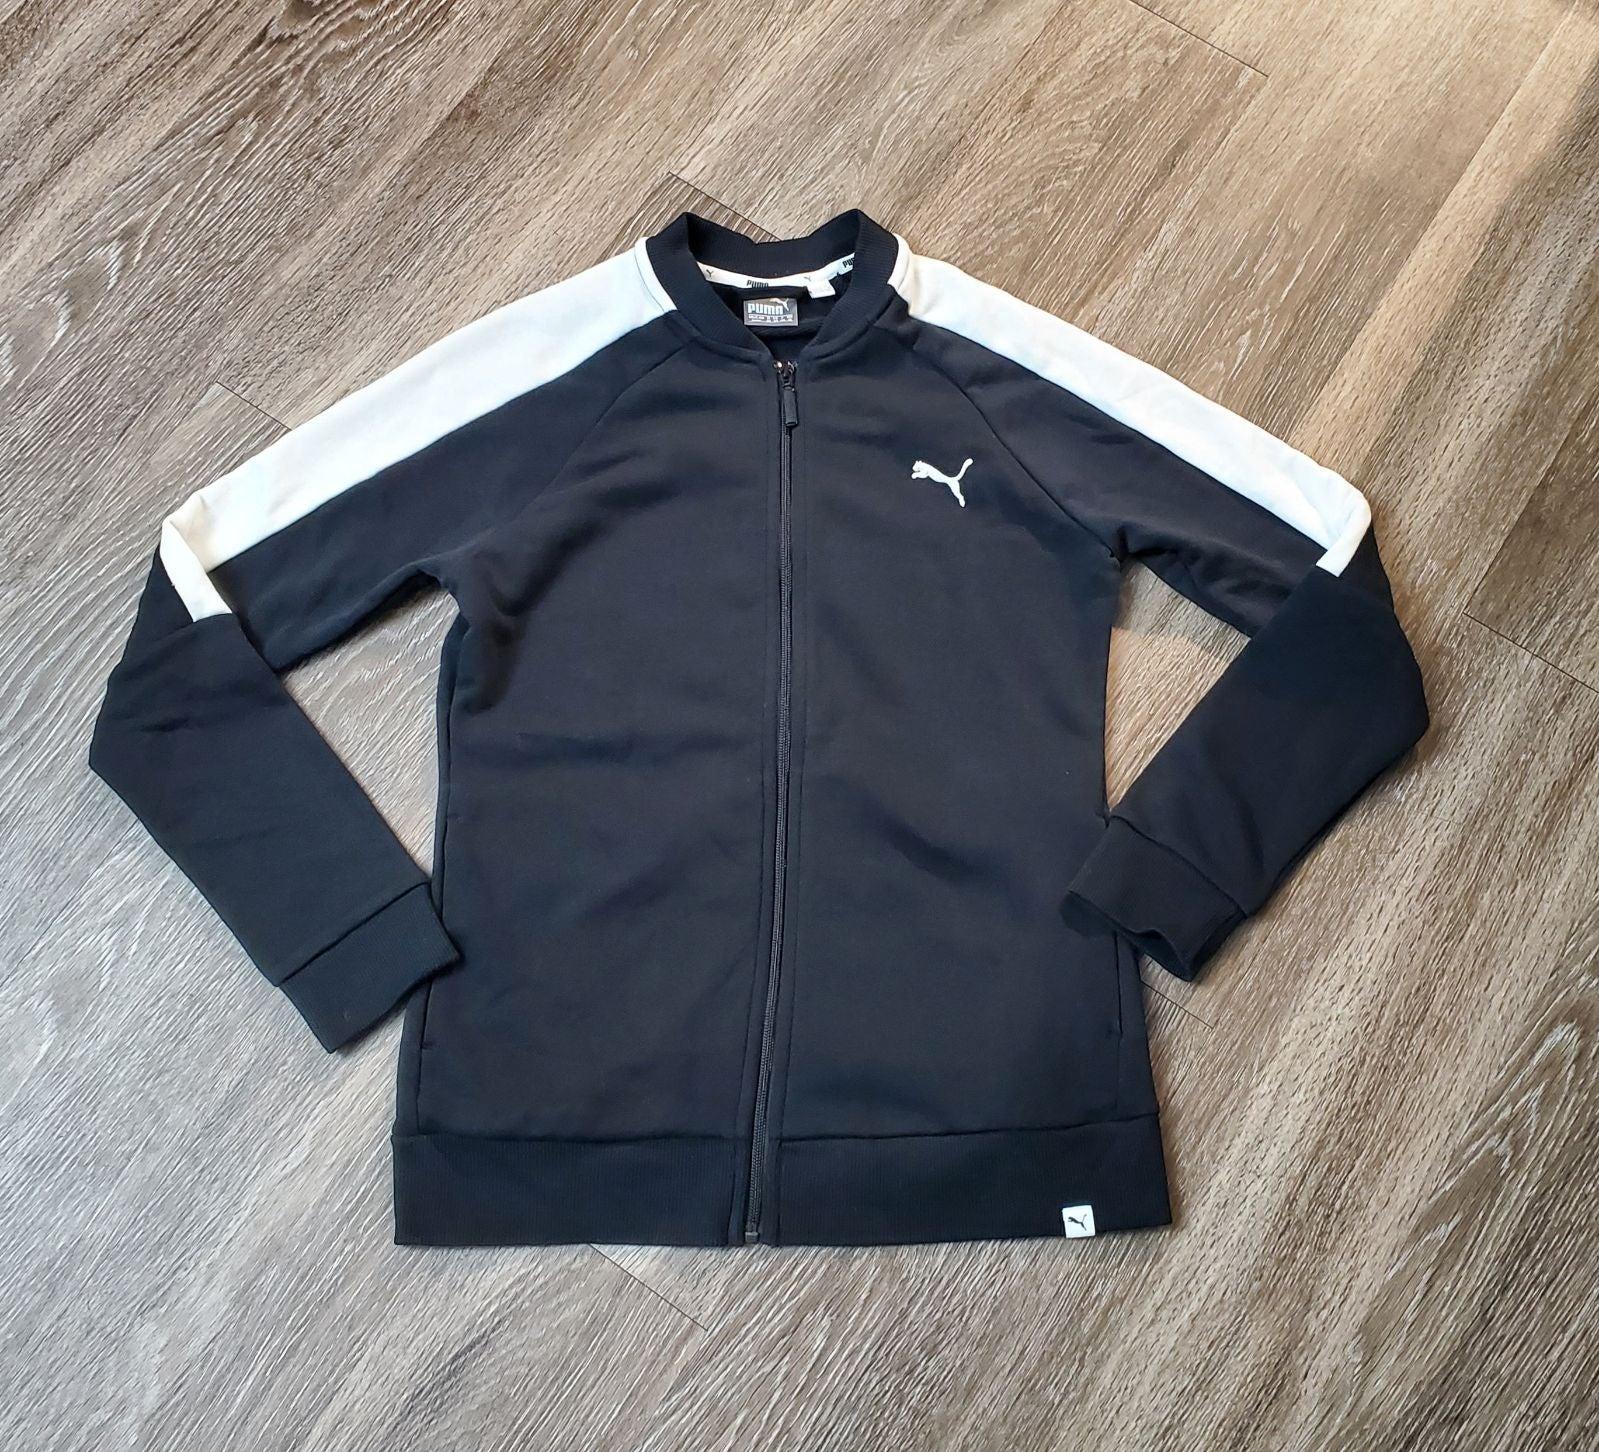 Puma women's medium black sweatshirt